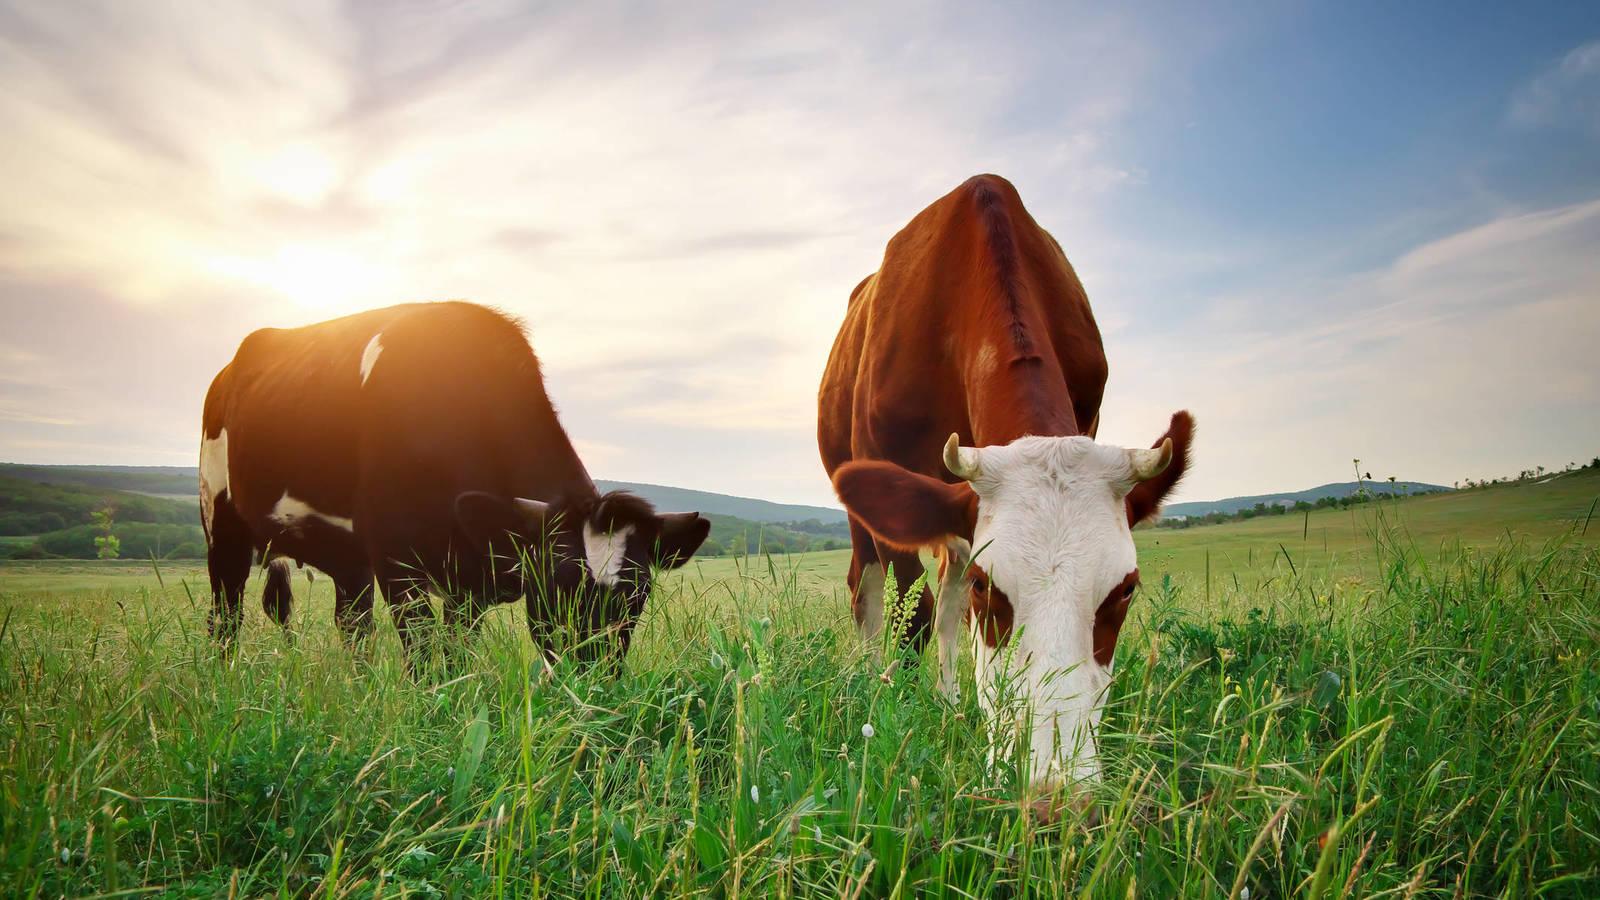 animales herbívoros comiendo